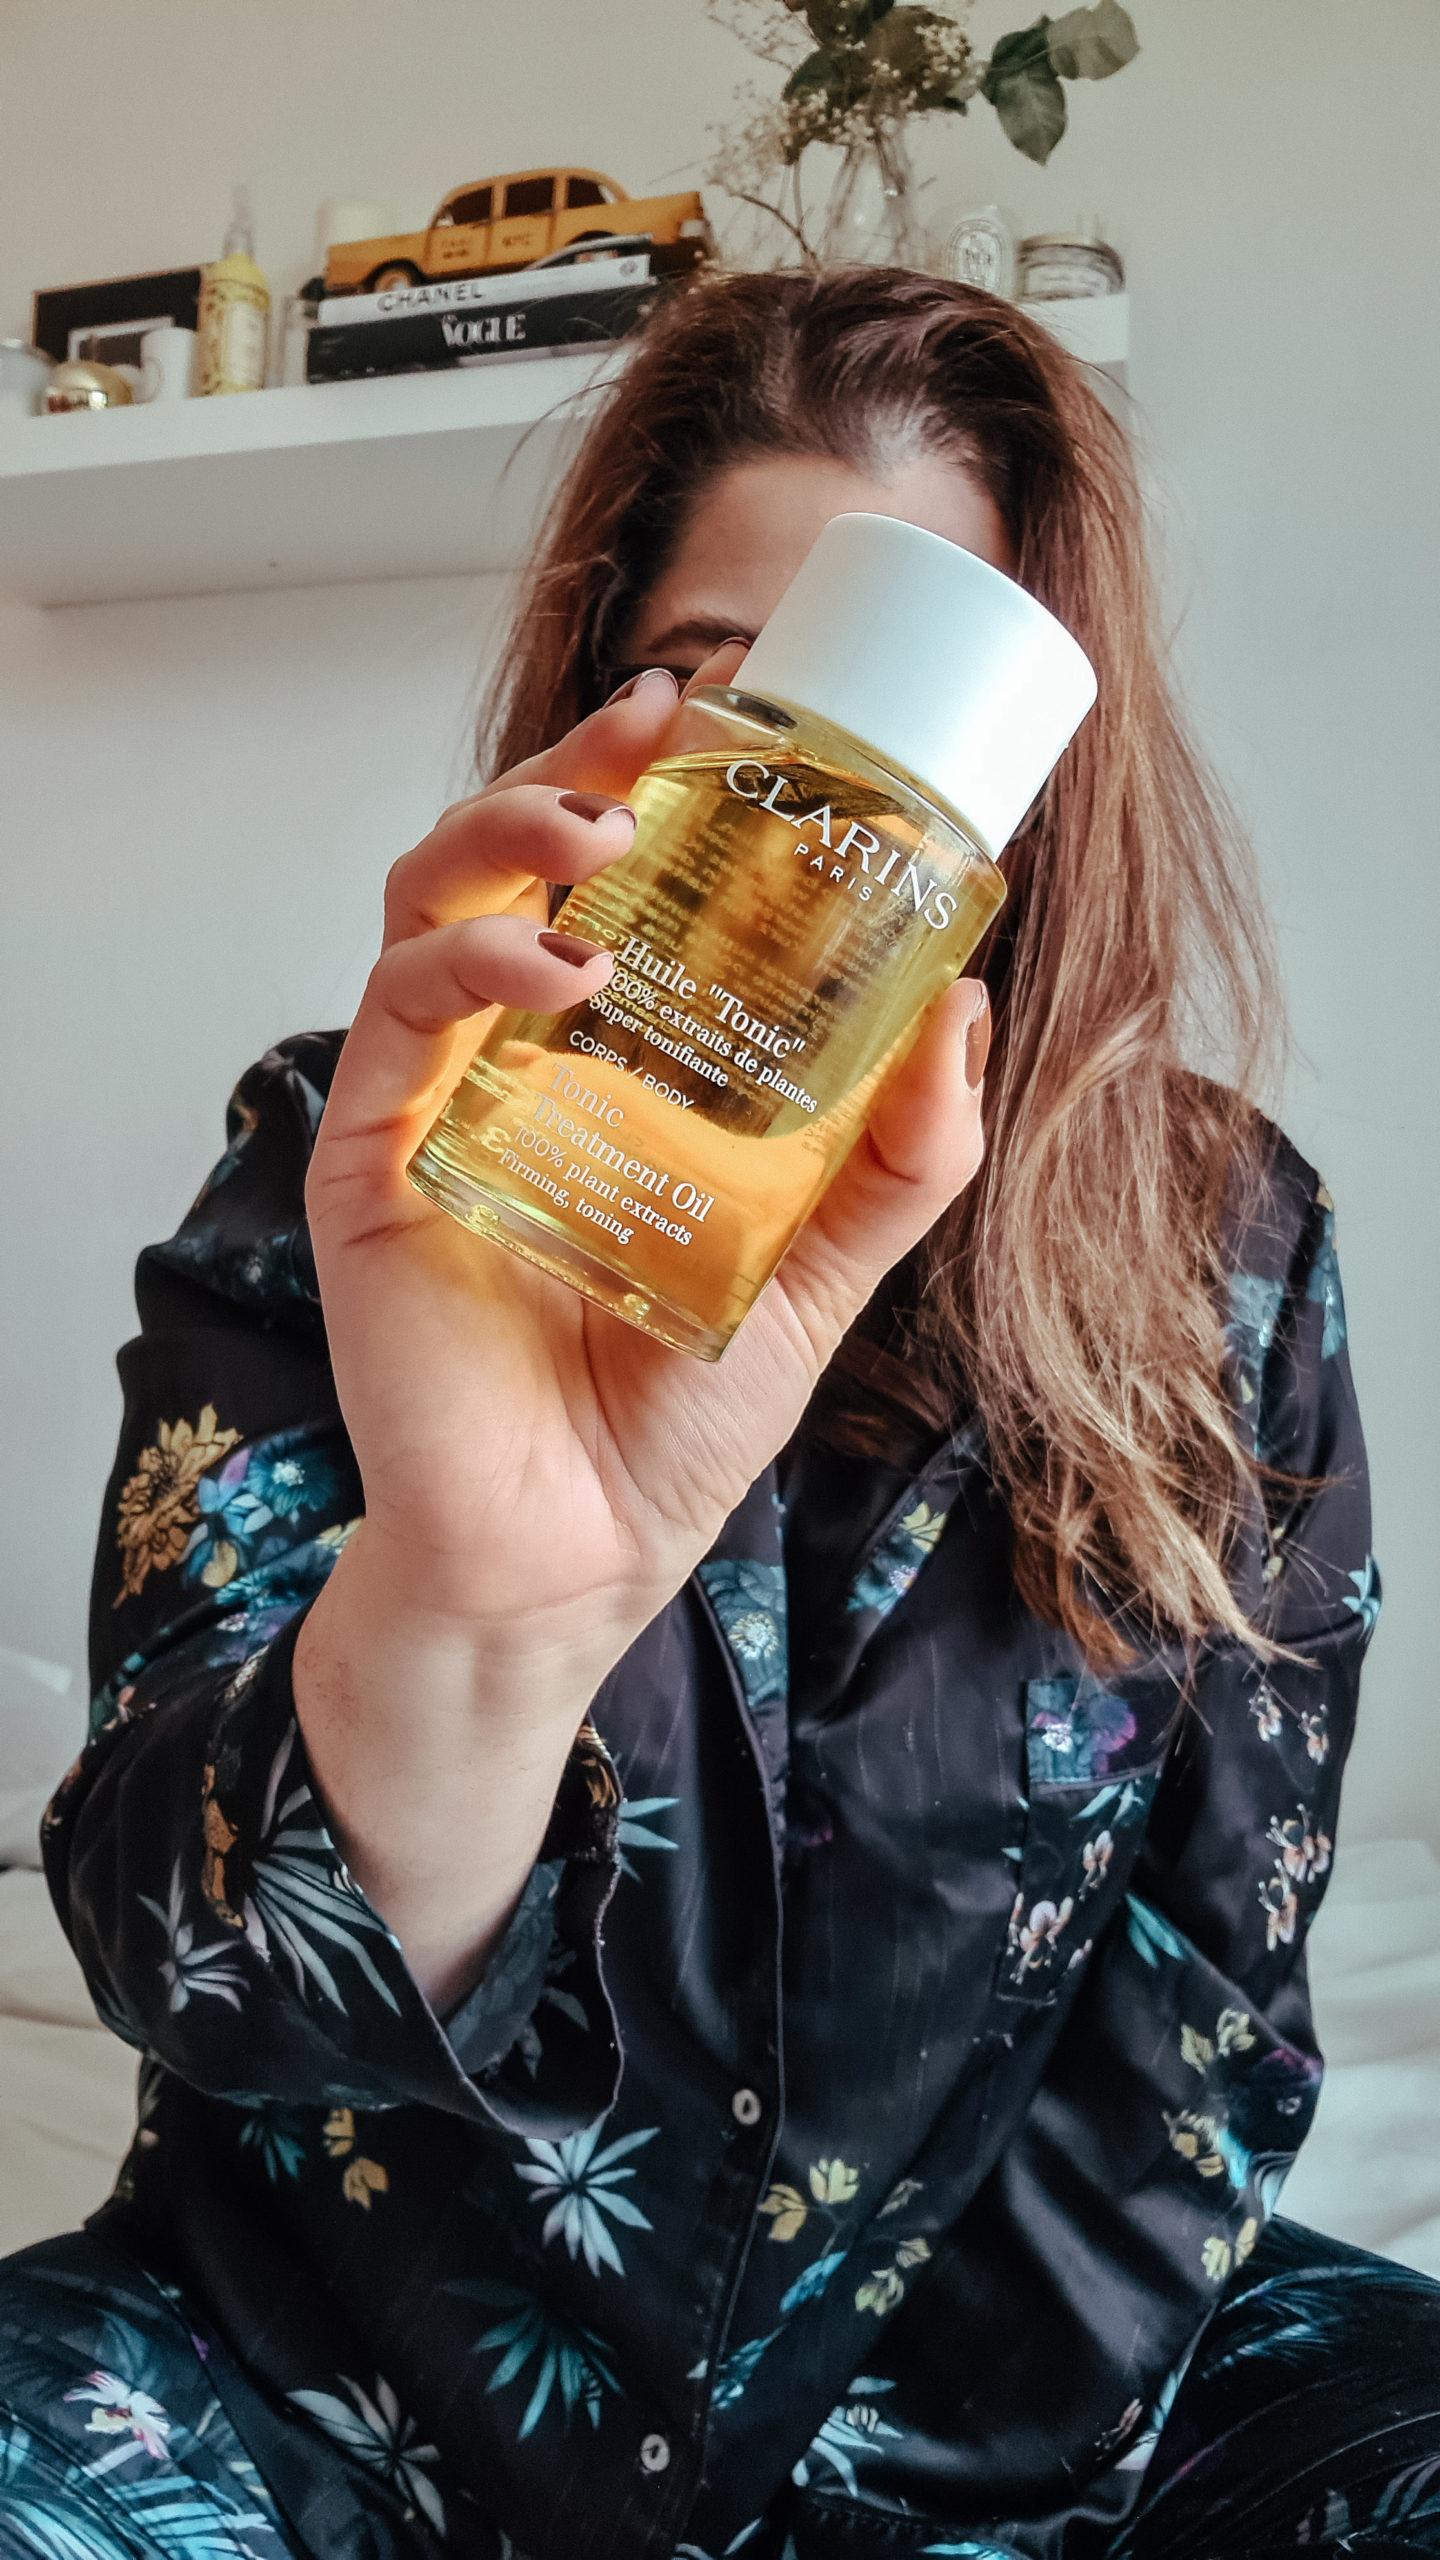 huile tonic clarins avis